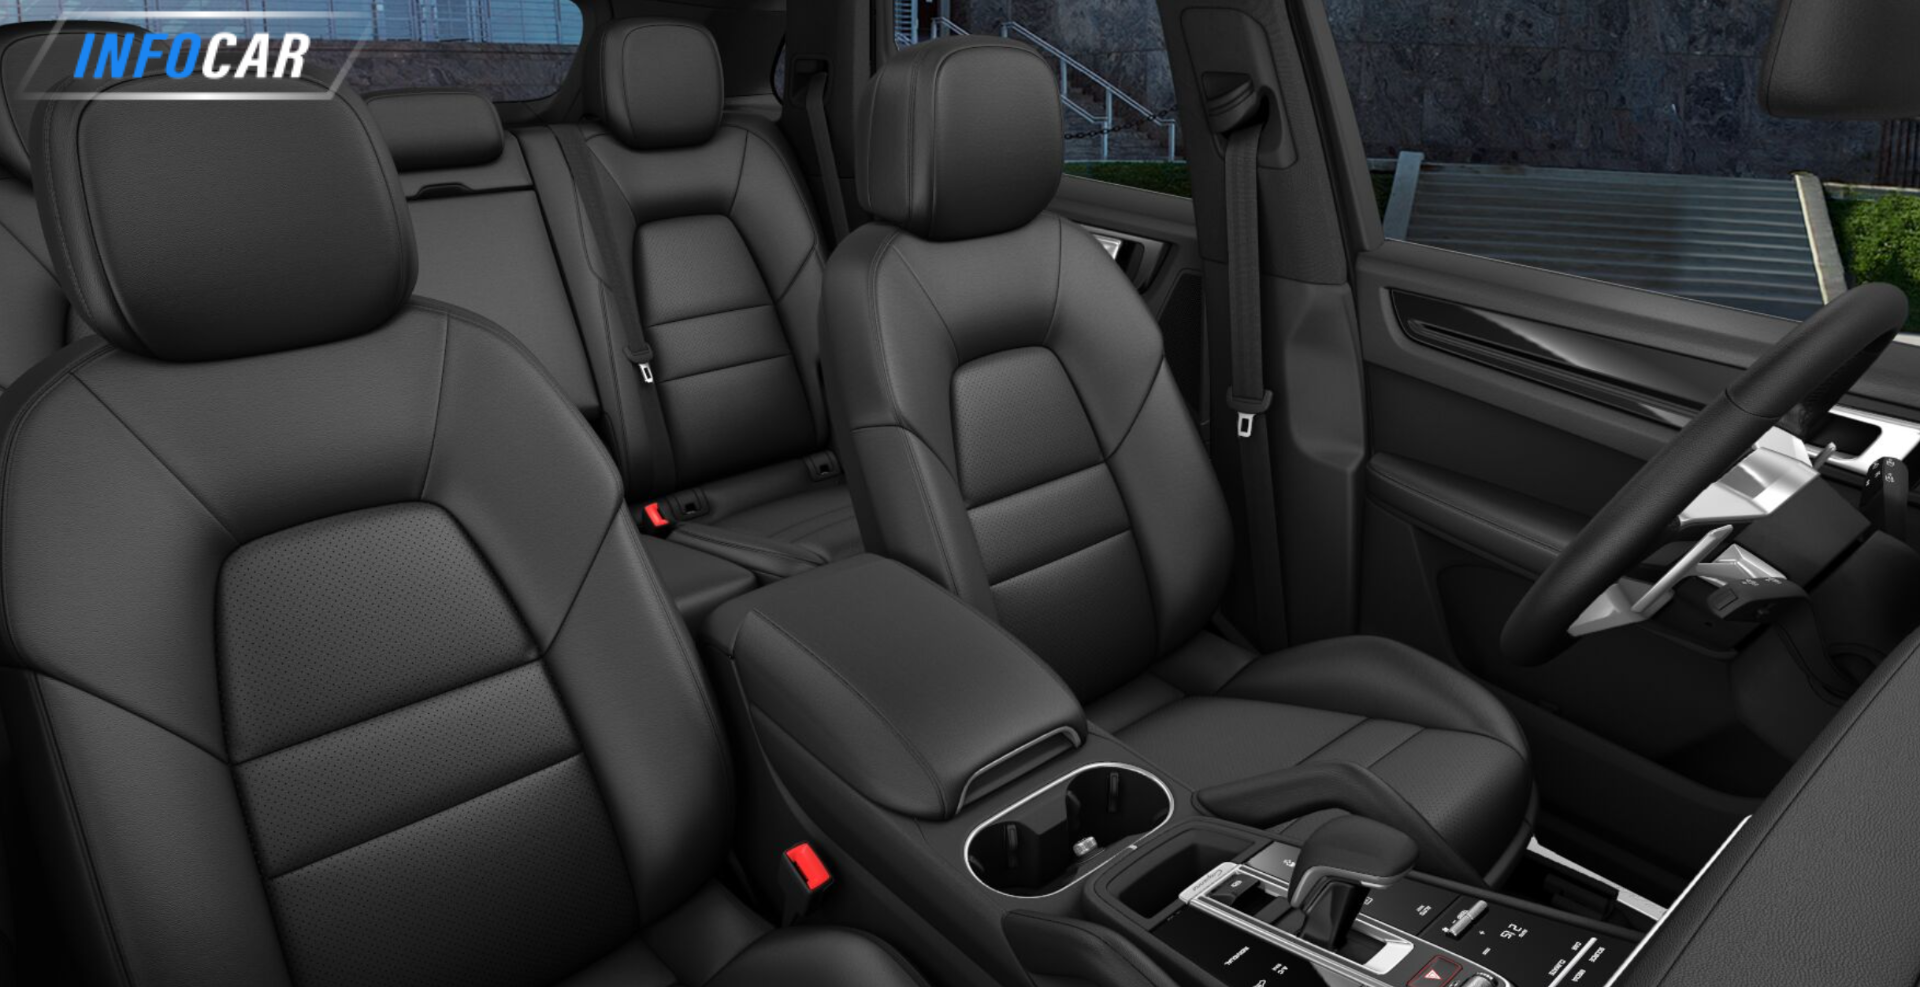 2021 Porsche Cayenne  - INFOCAR - Toronto's Most Comprehensive New and Used Auto Trading Platform